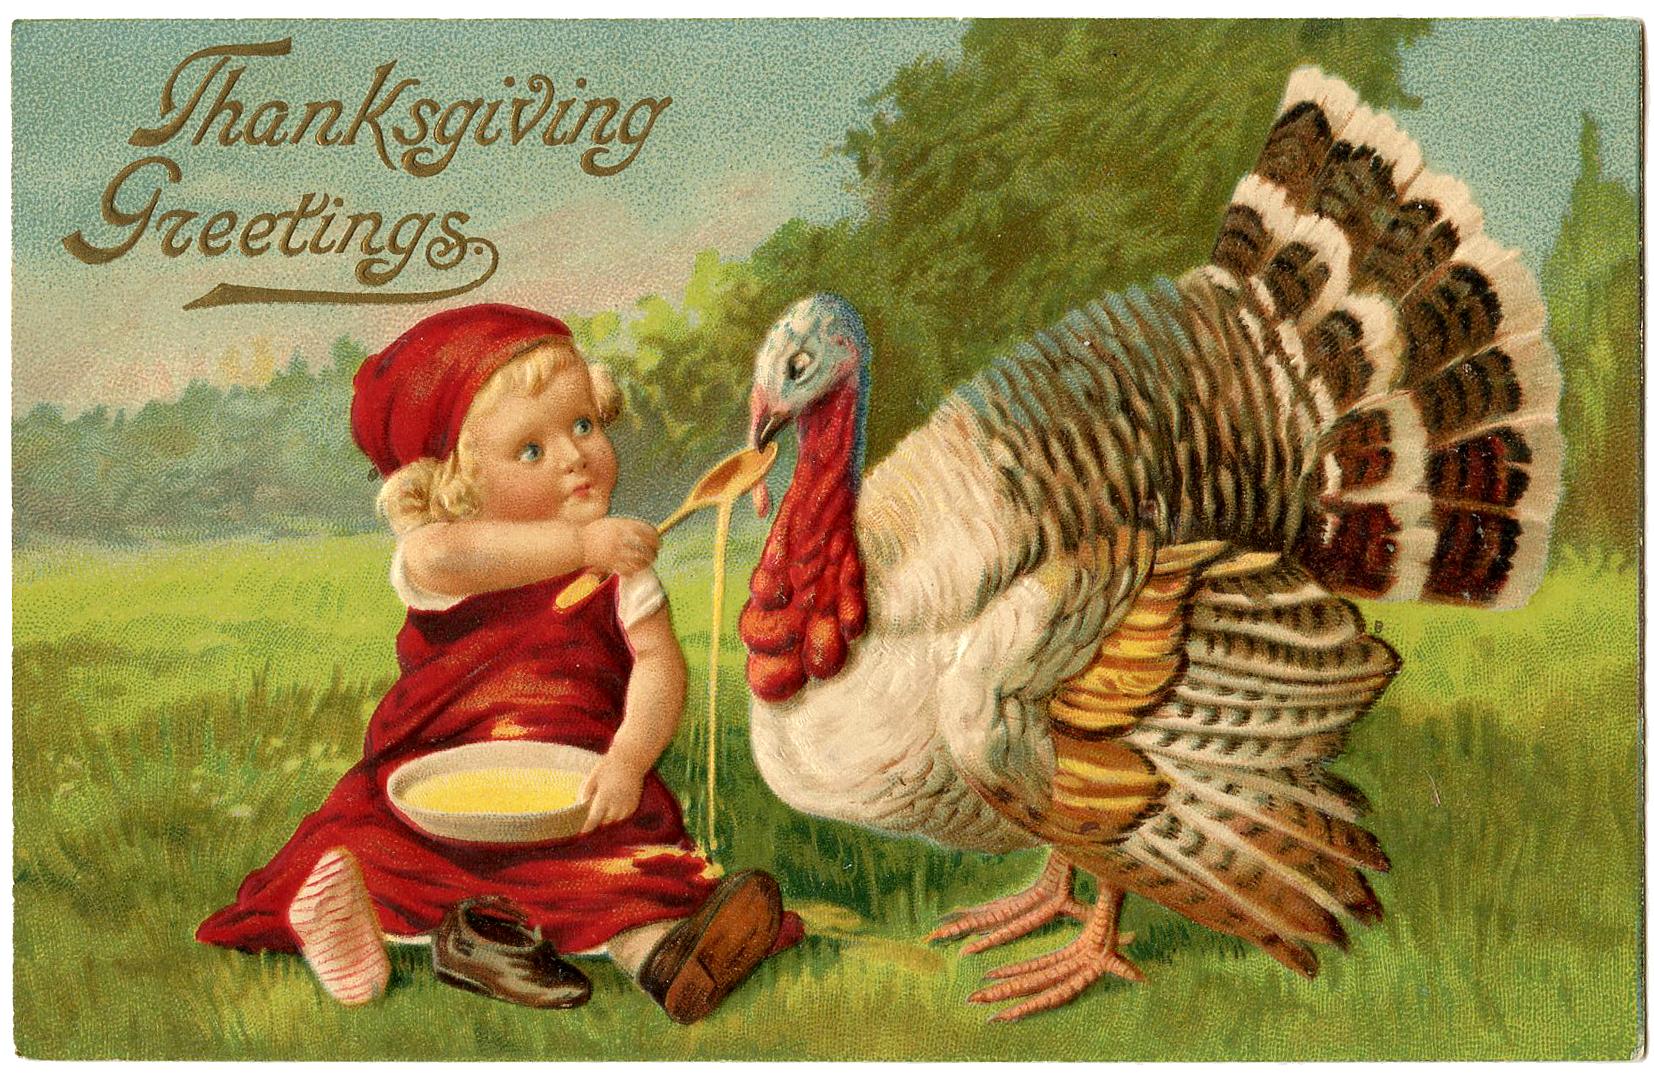 Child feeding a Turkey on Thanksgiving